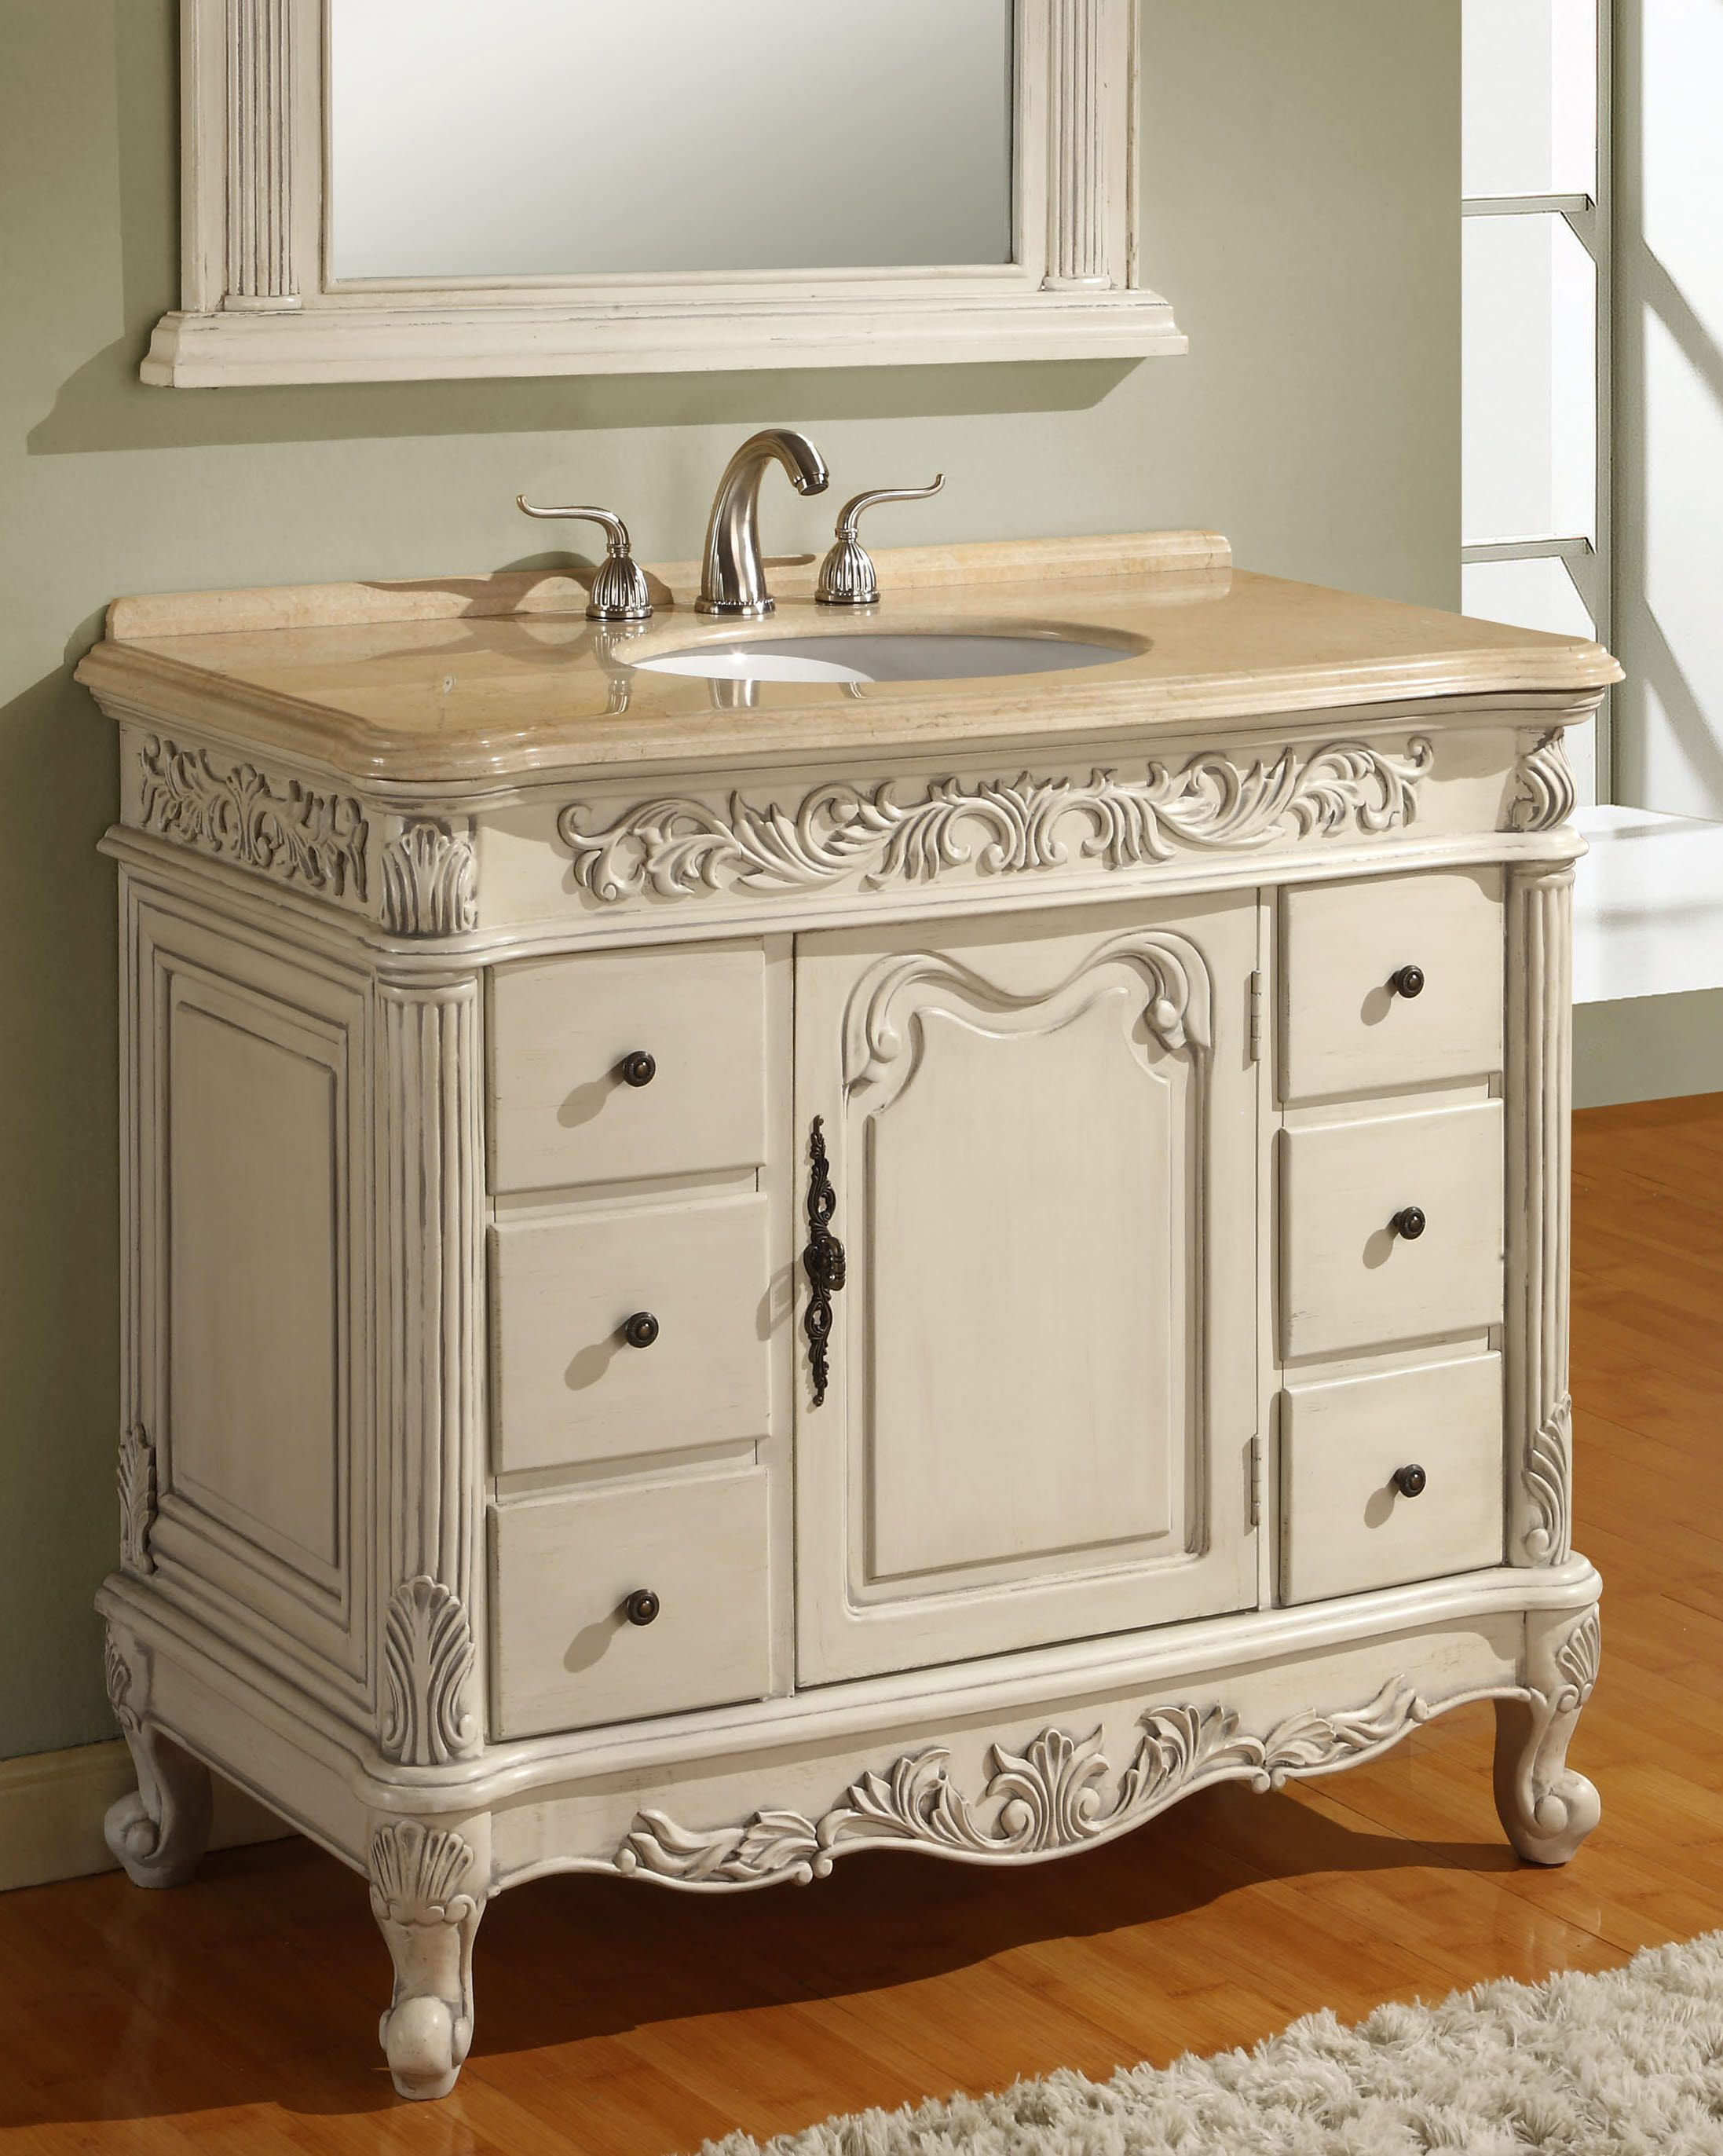 Antique style 40 inch bath vanity - Item 4340 - one shelf ...